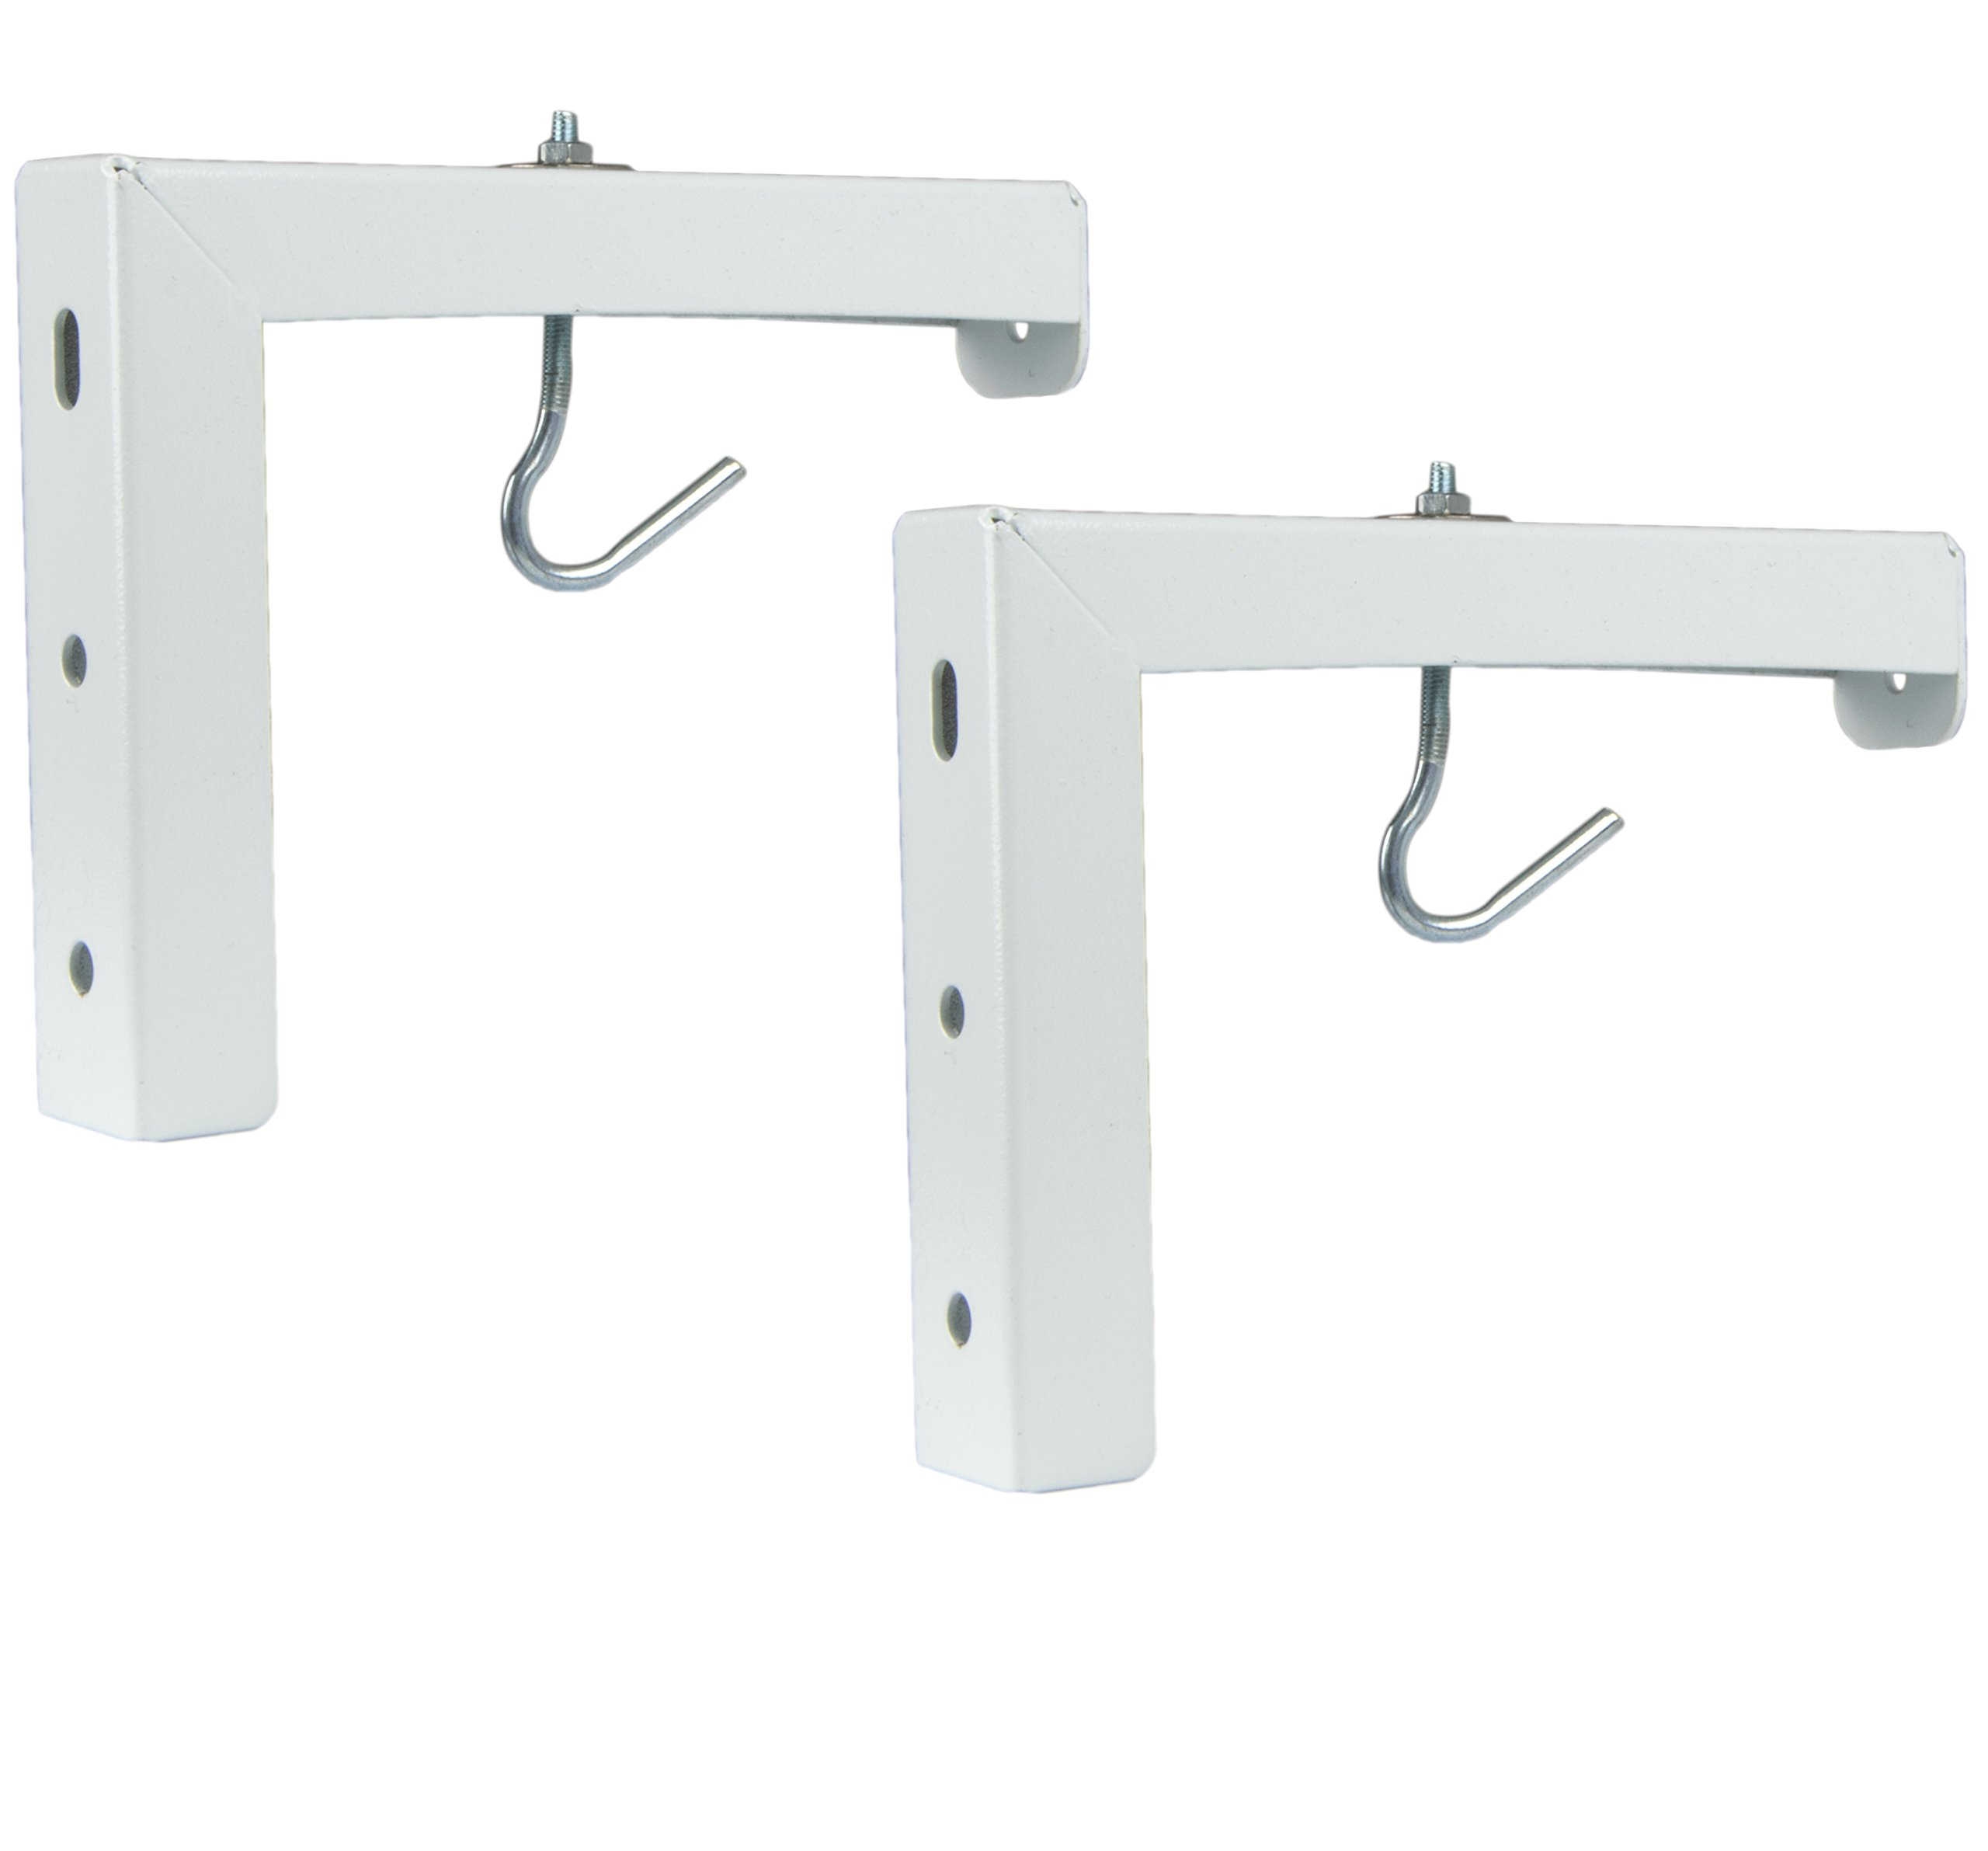 VIVO Universal Wall Hanging 6'' Adjustable L-Bracket Mount Plate Hook Kit for Projector Screens (MOUNT-PS01)